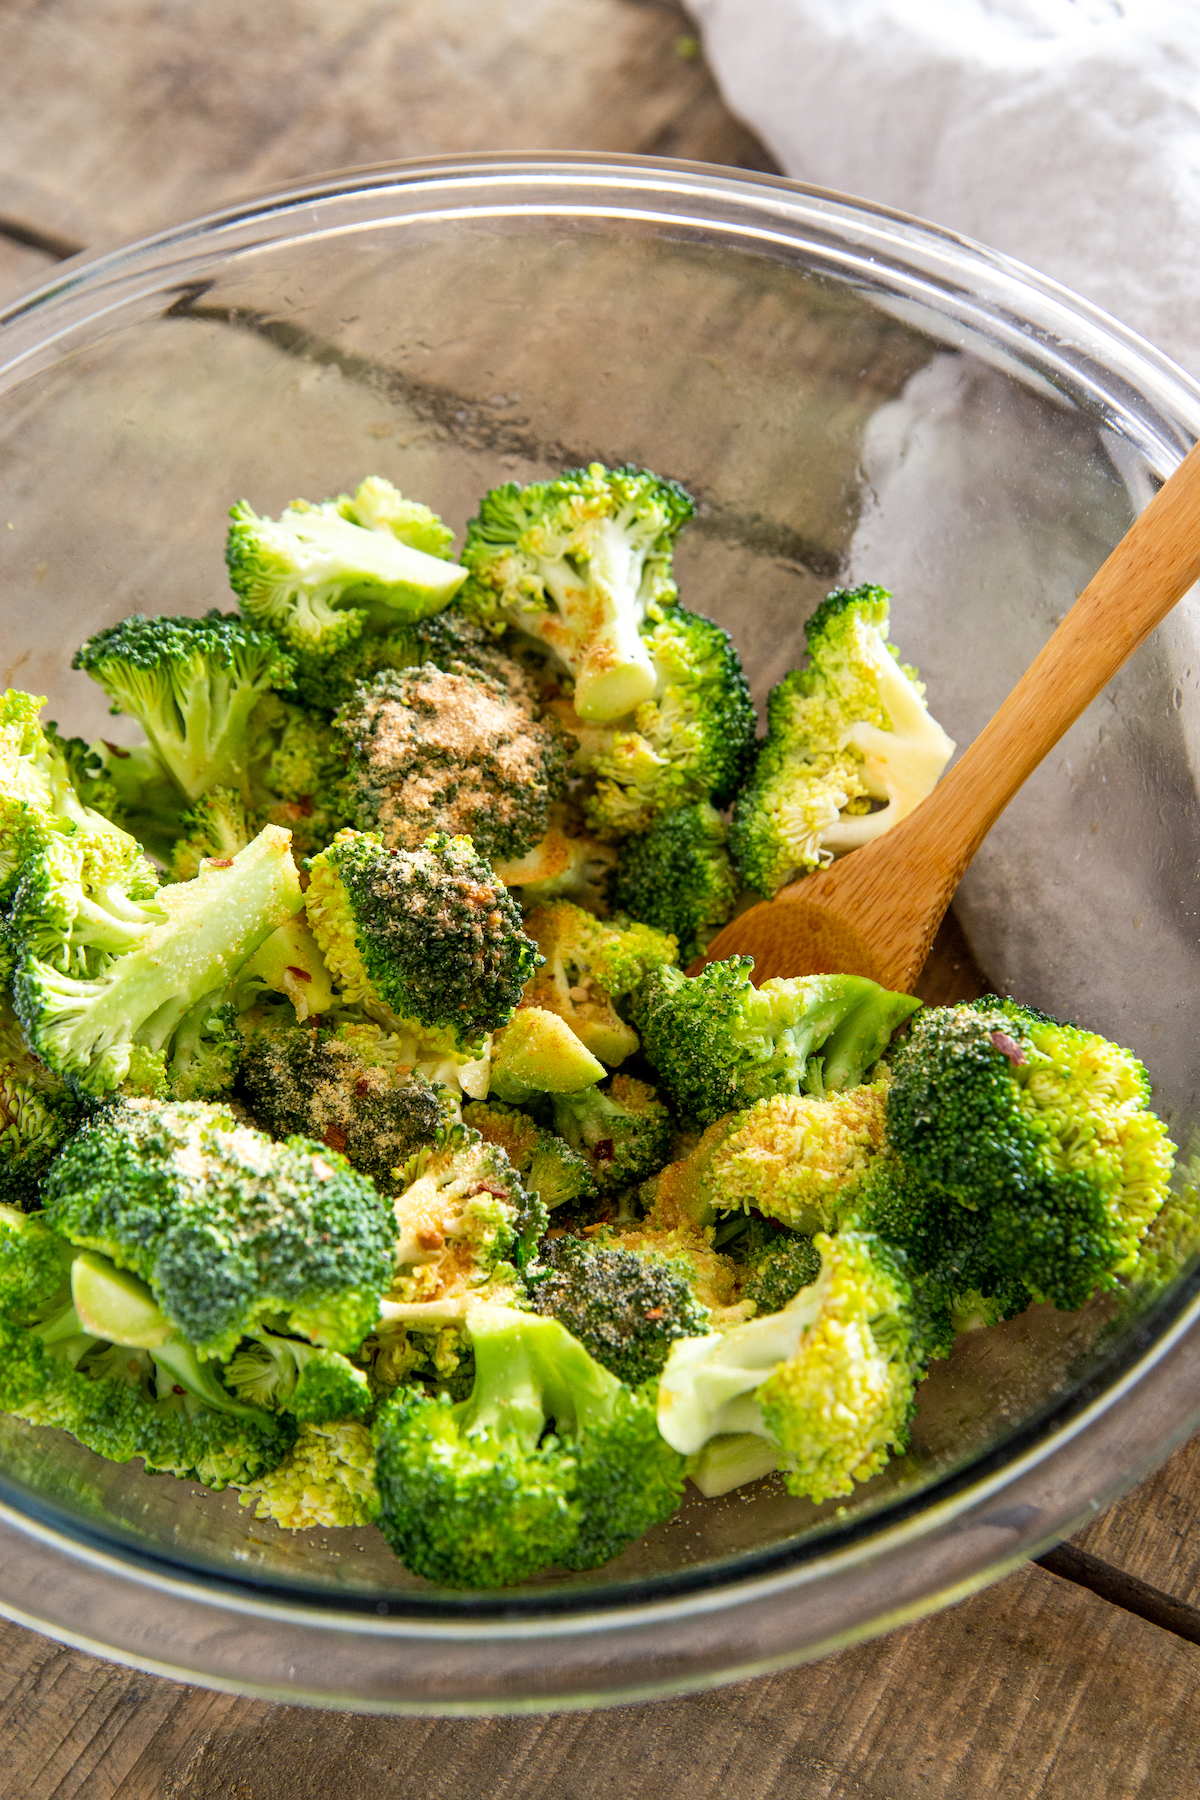 Seasoned broccoli florets in a bowl.